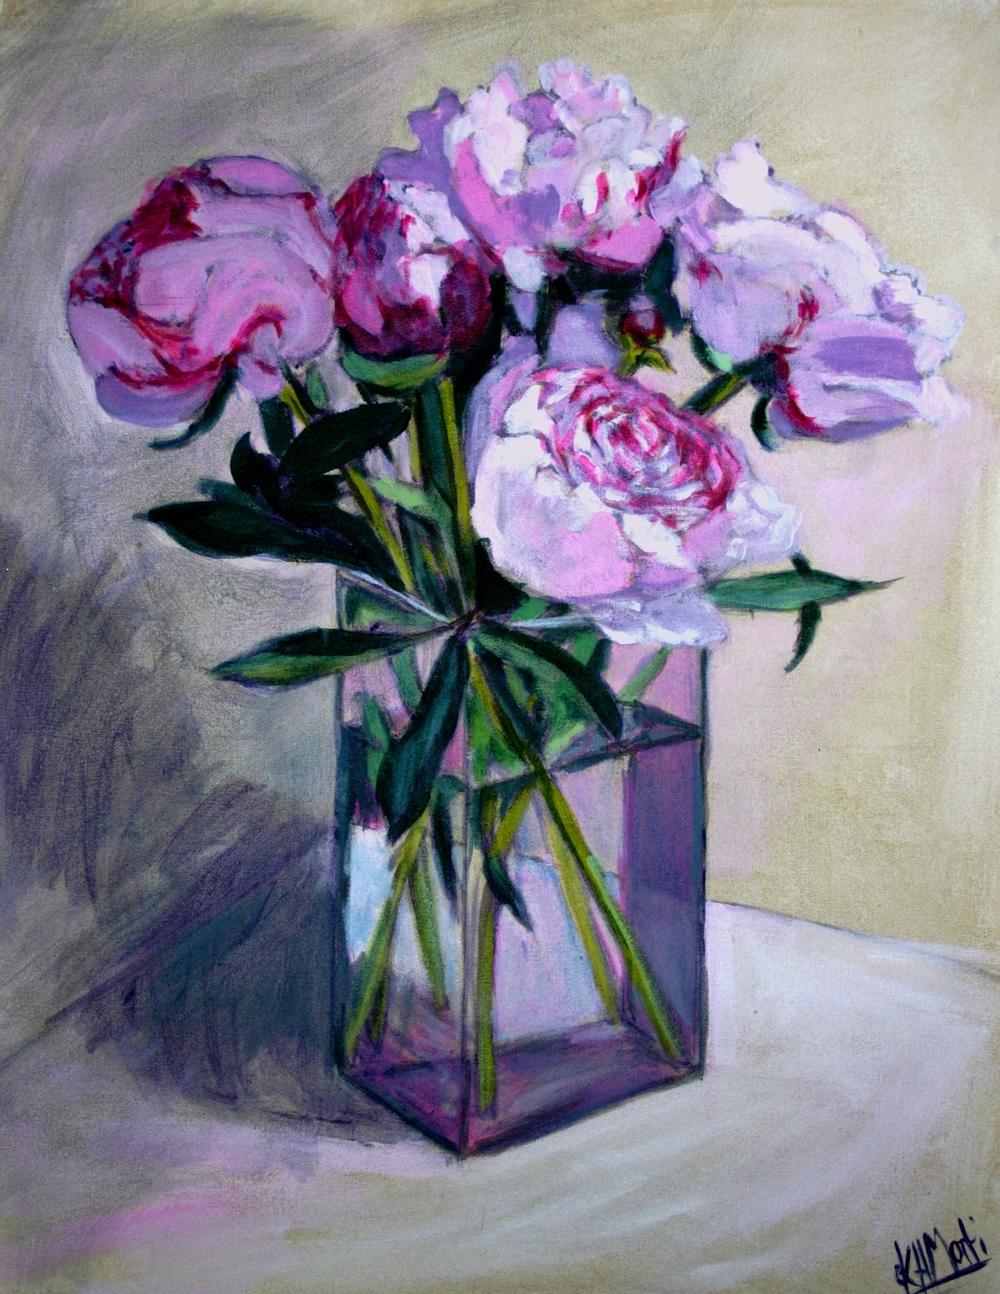 Peony Roses in Rectangular Vase by Karen Mortimore.JPG